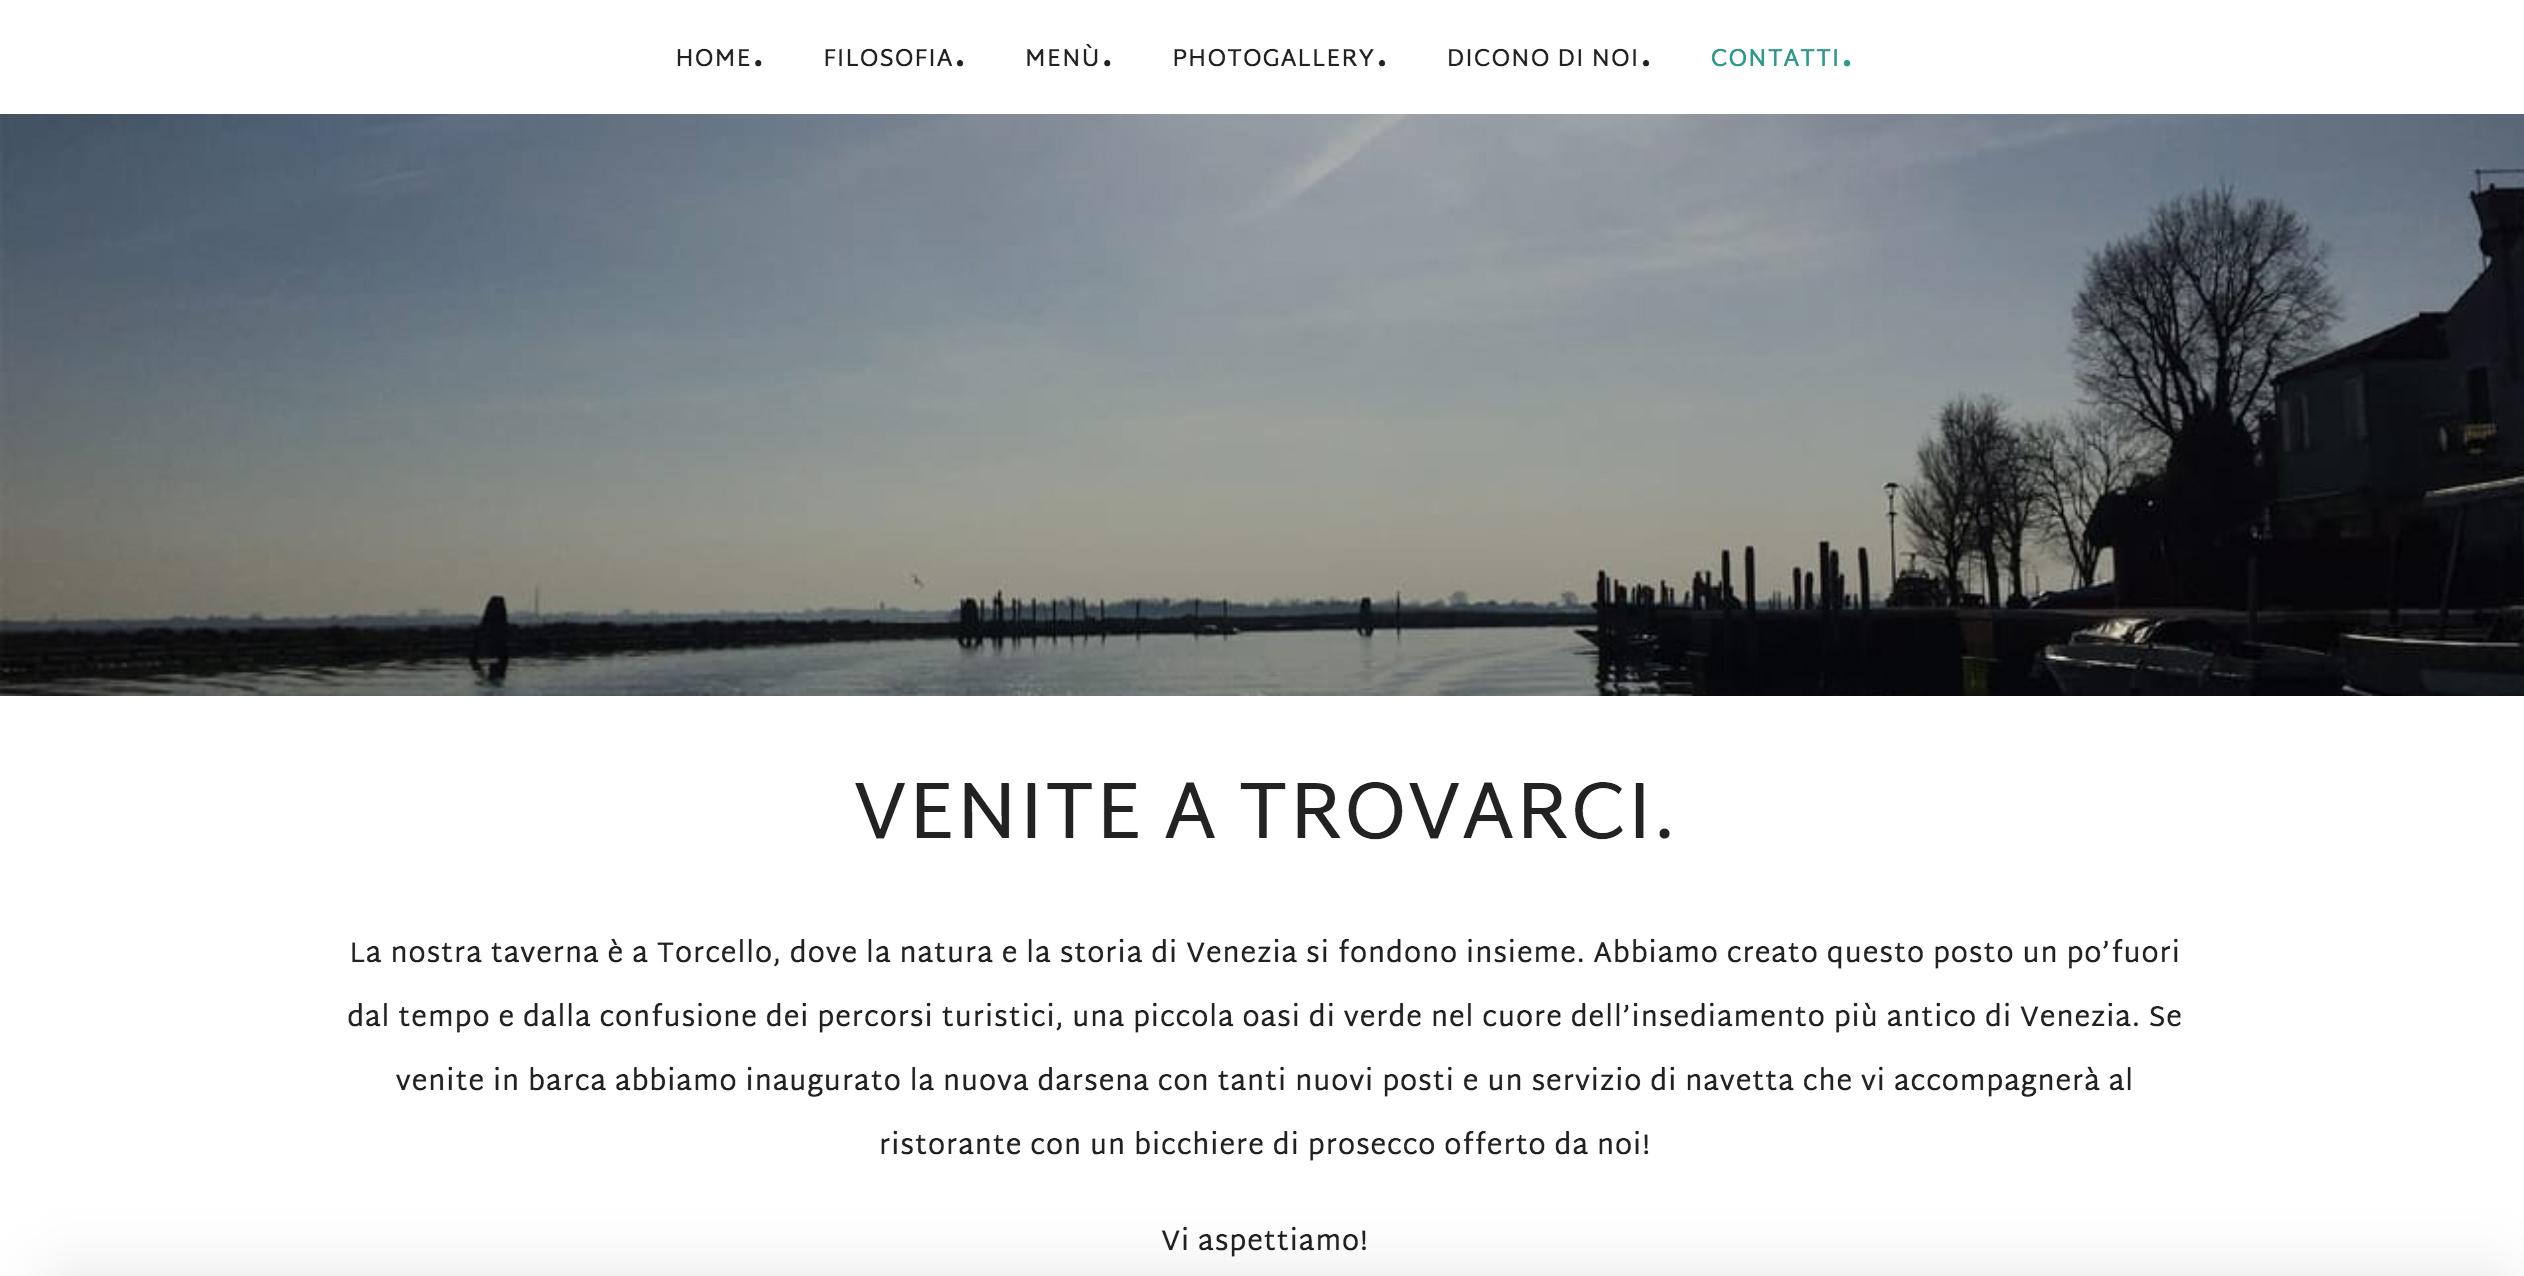 Taverna Veneziana pink different siti web professionali Venezia-Treviso-Veneto